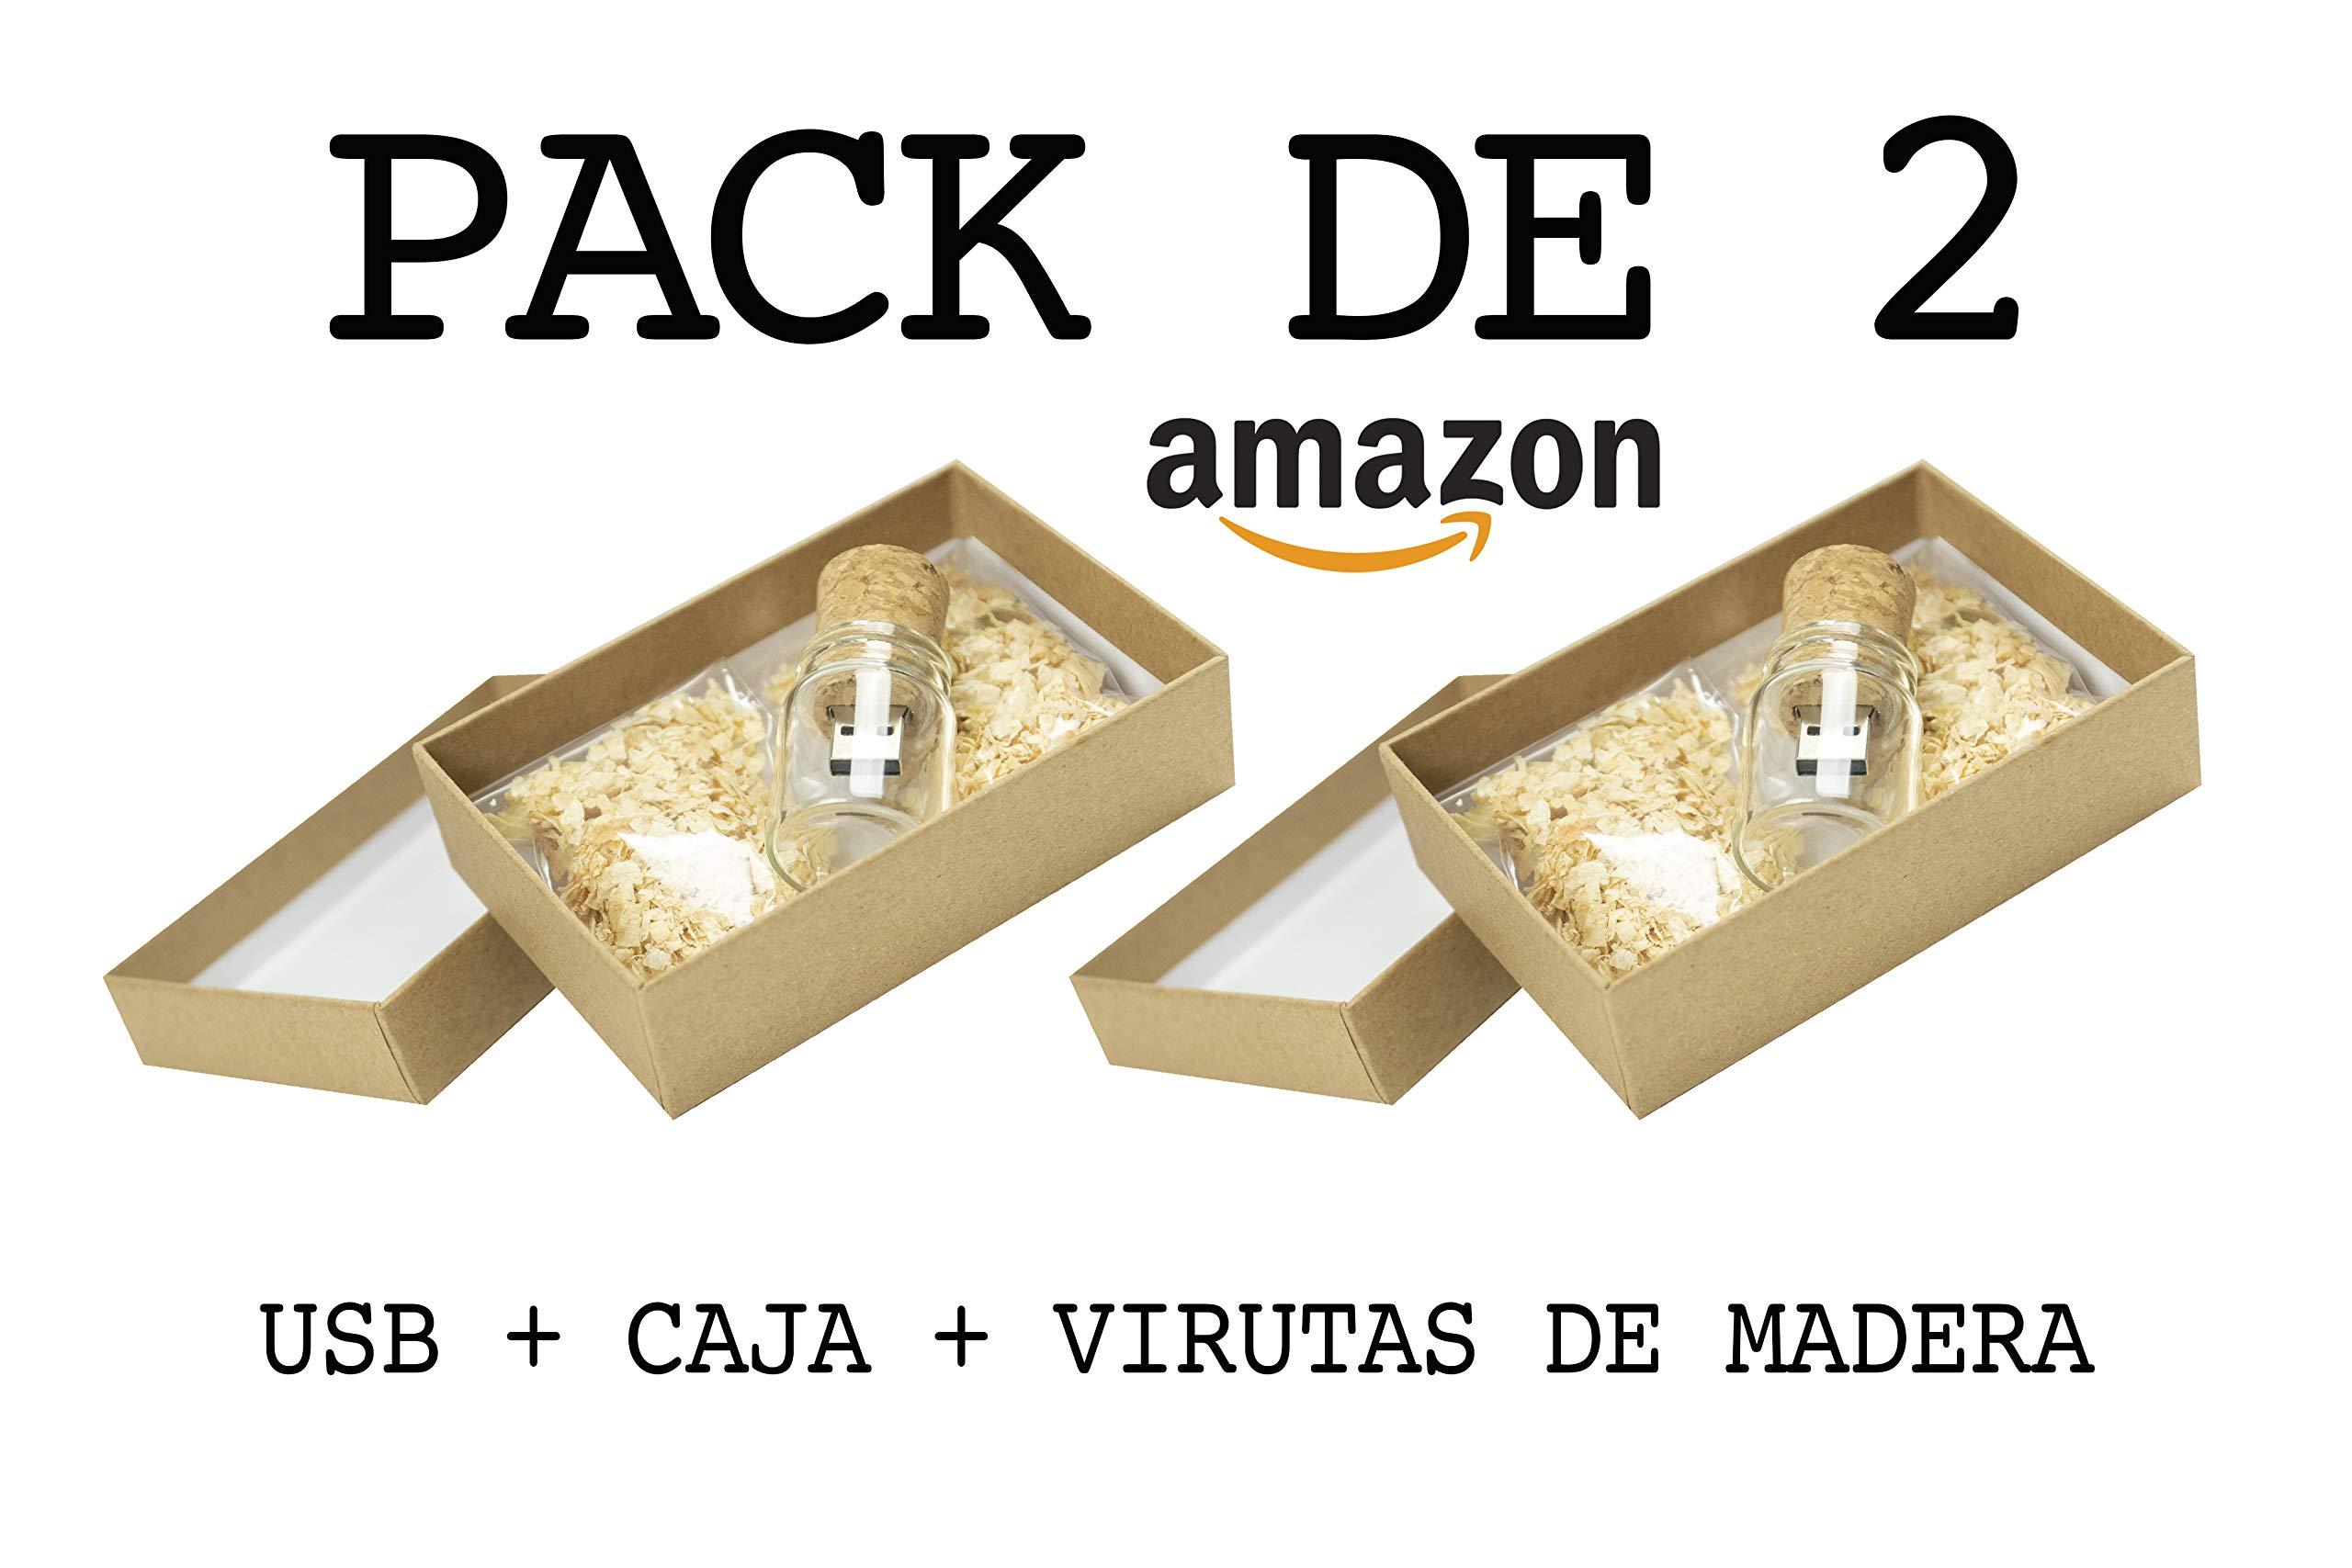 Luglez Pack de 2 USB (16 GB) para Fotógrafos Botella de Cristal con Corcho + Caja